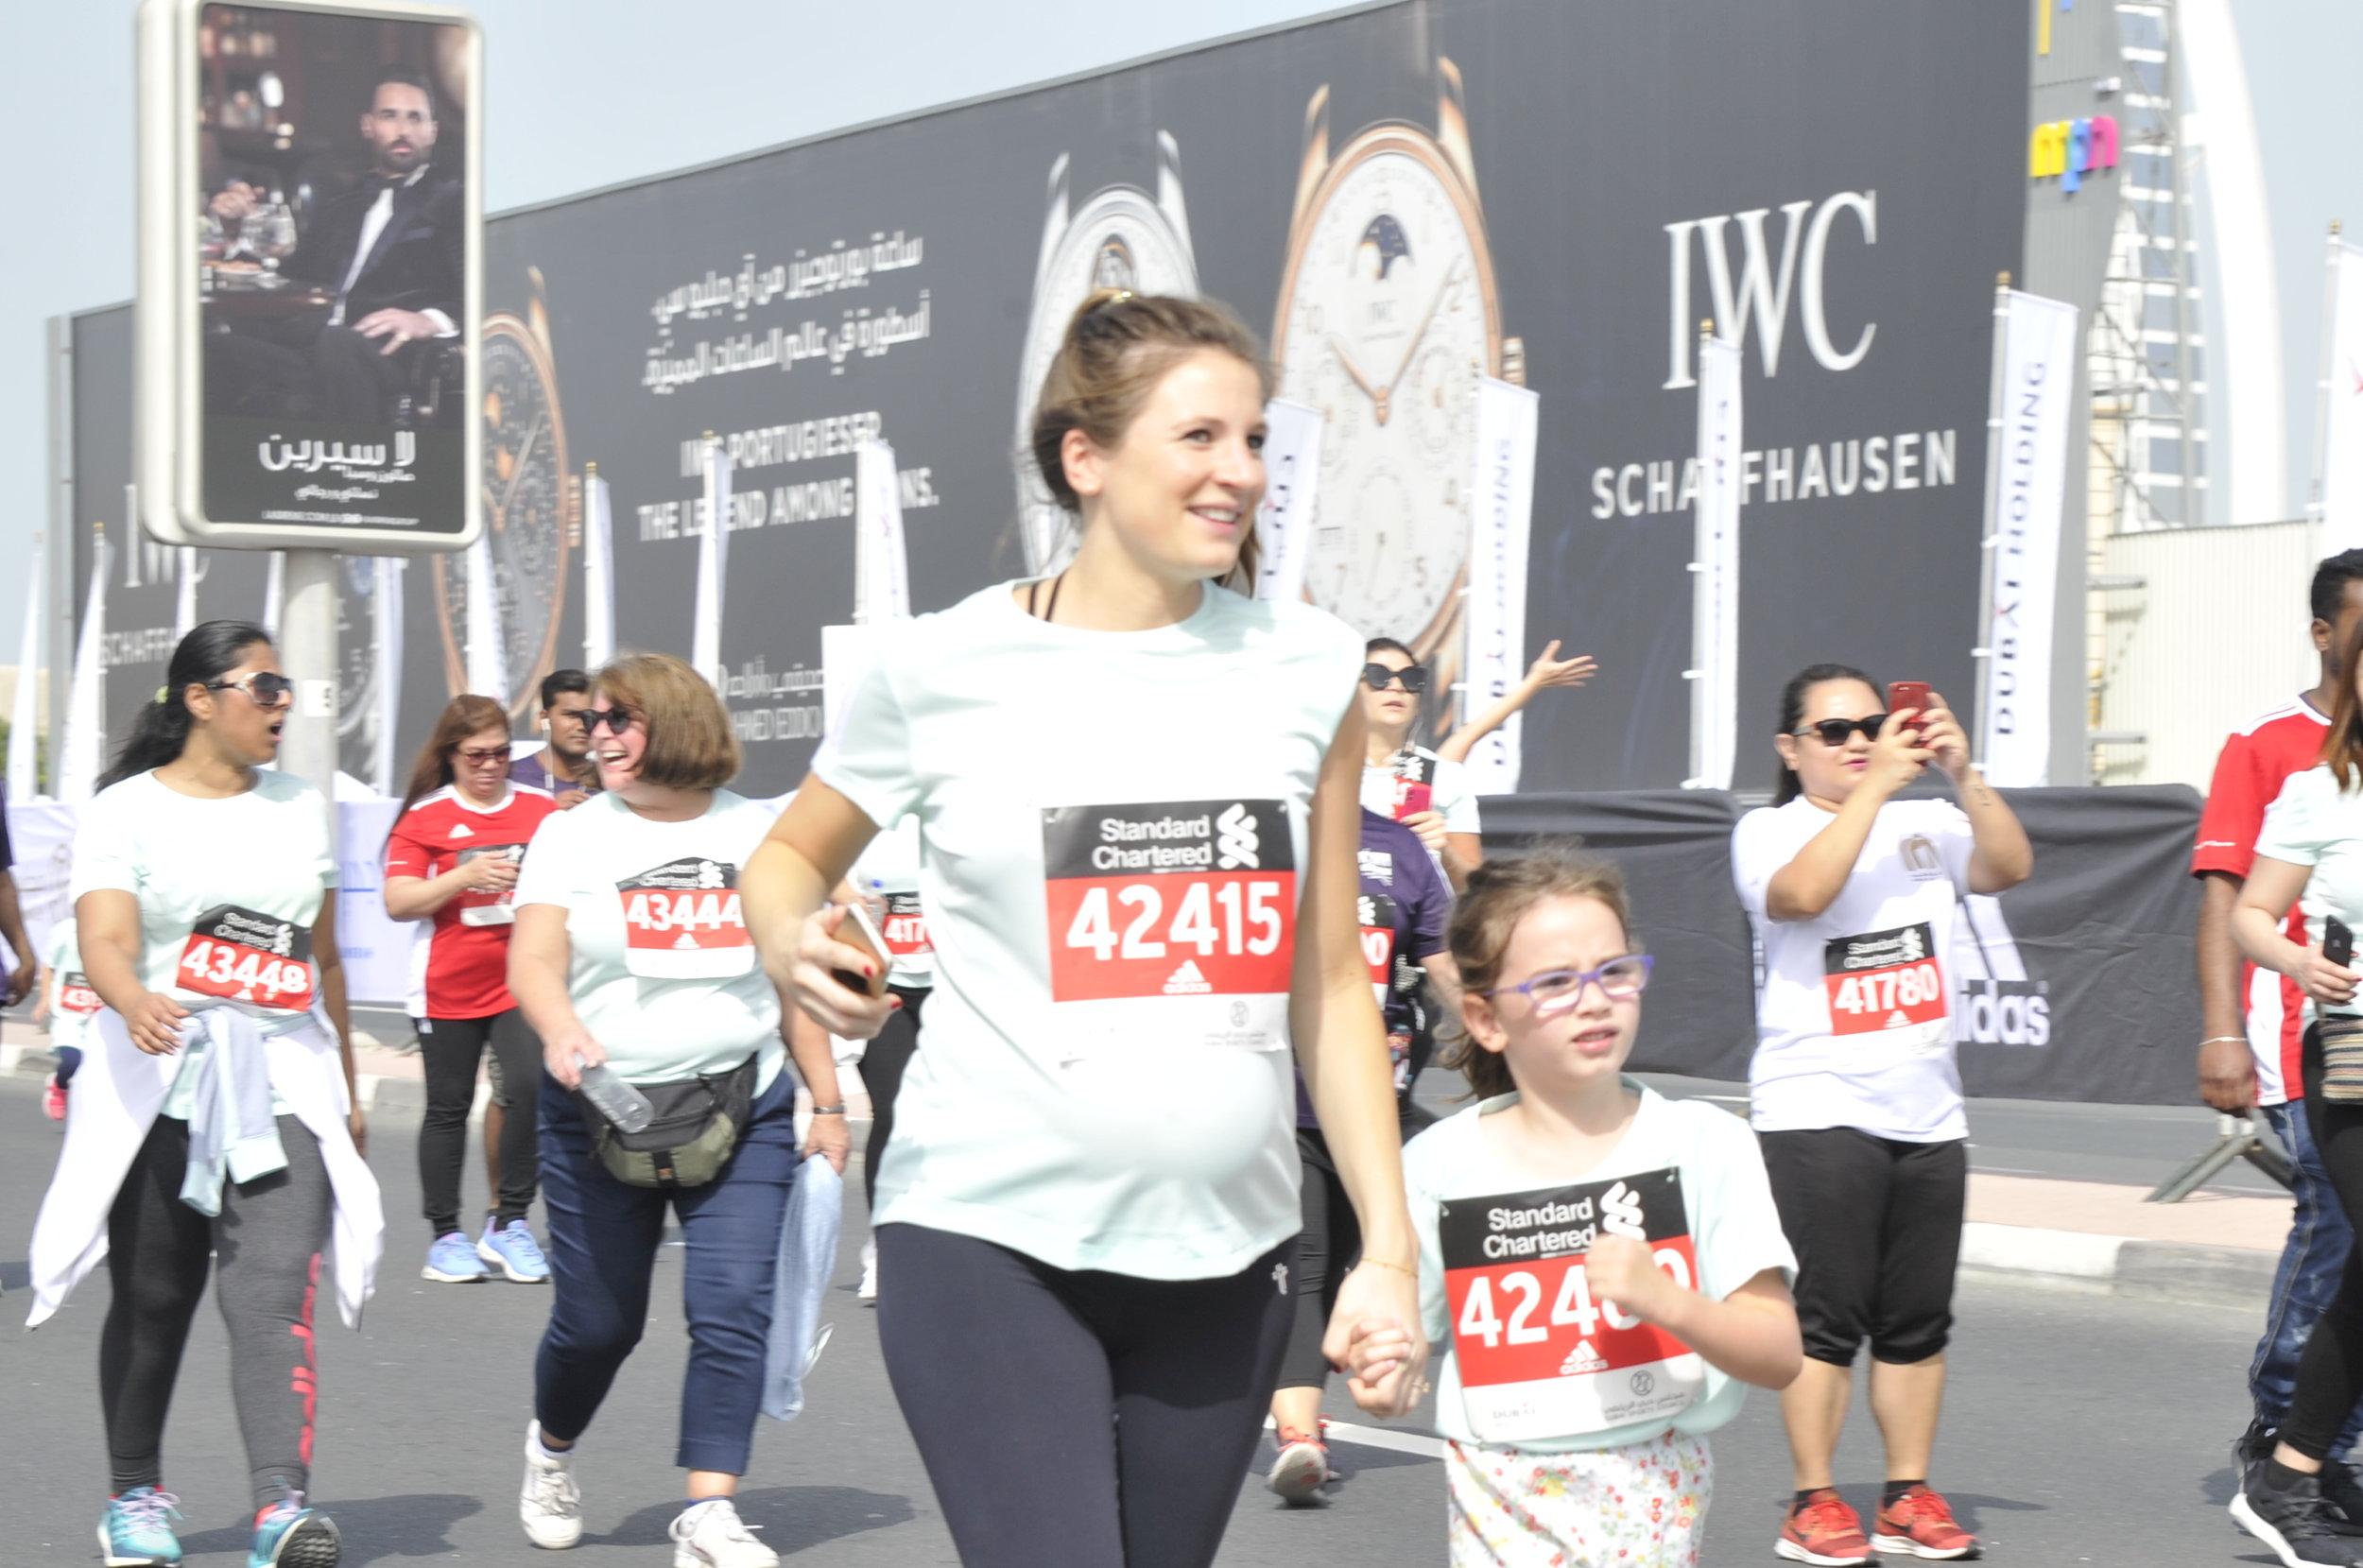 Leo and her Aunty Catherine running the 4K family fun run as part of the Dubai Standard Chartered Marathon 2019